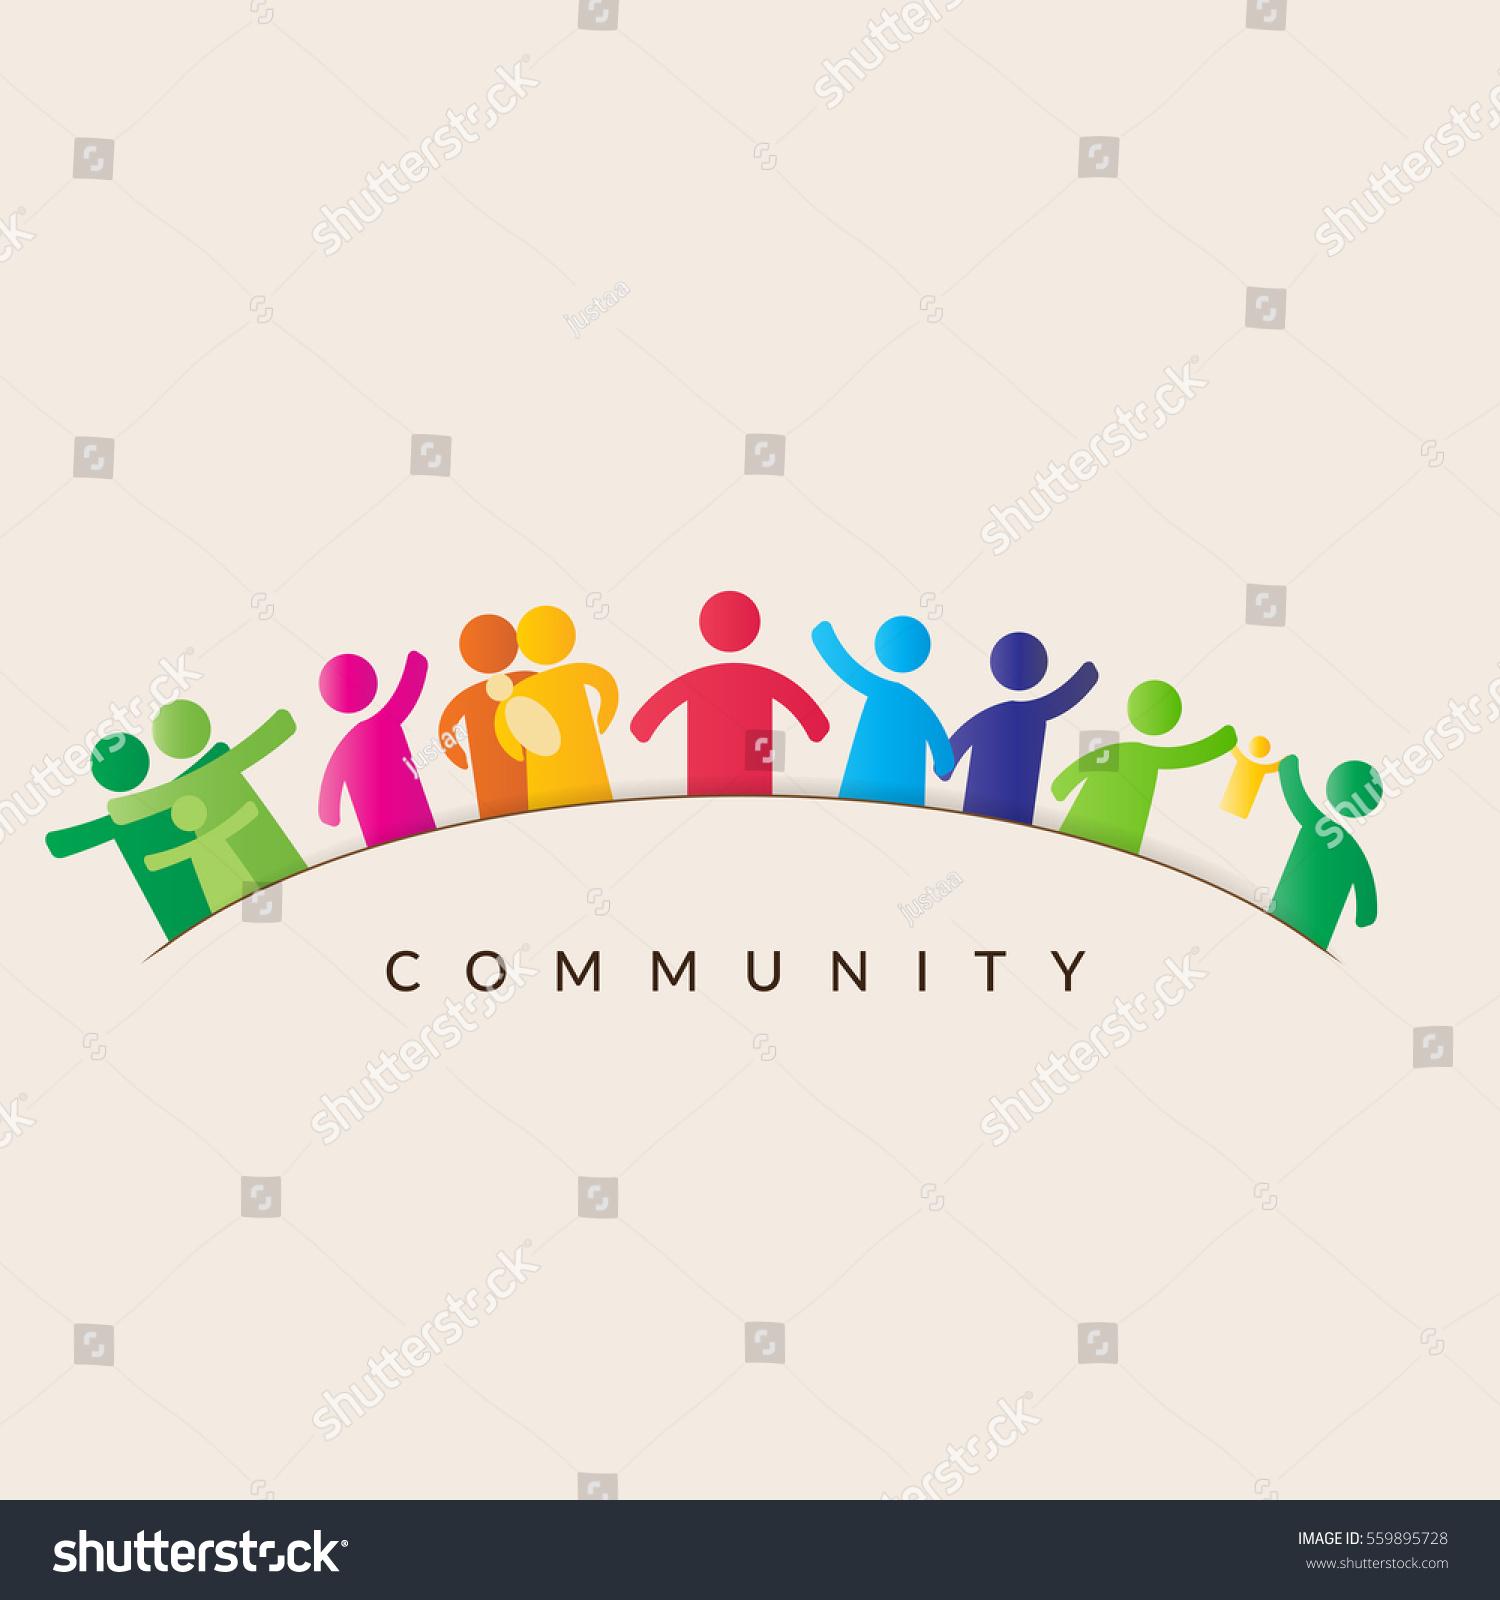 Community Concept Pictogram Showing Figures Happy Stock ...